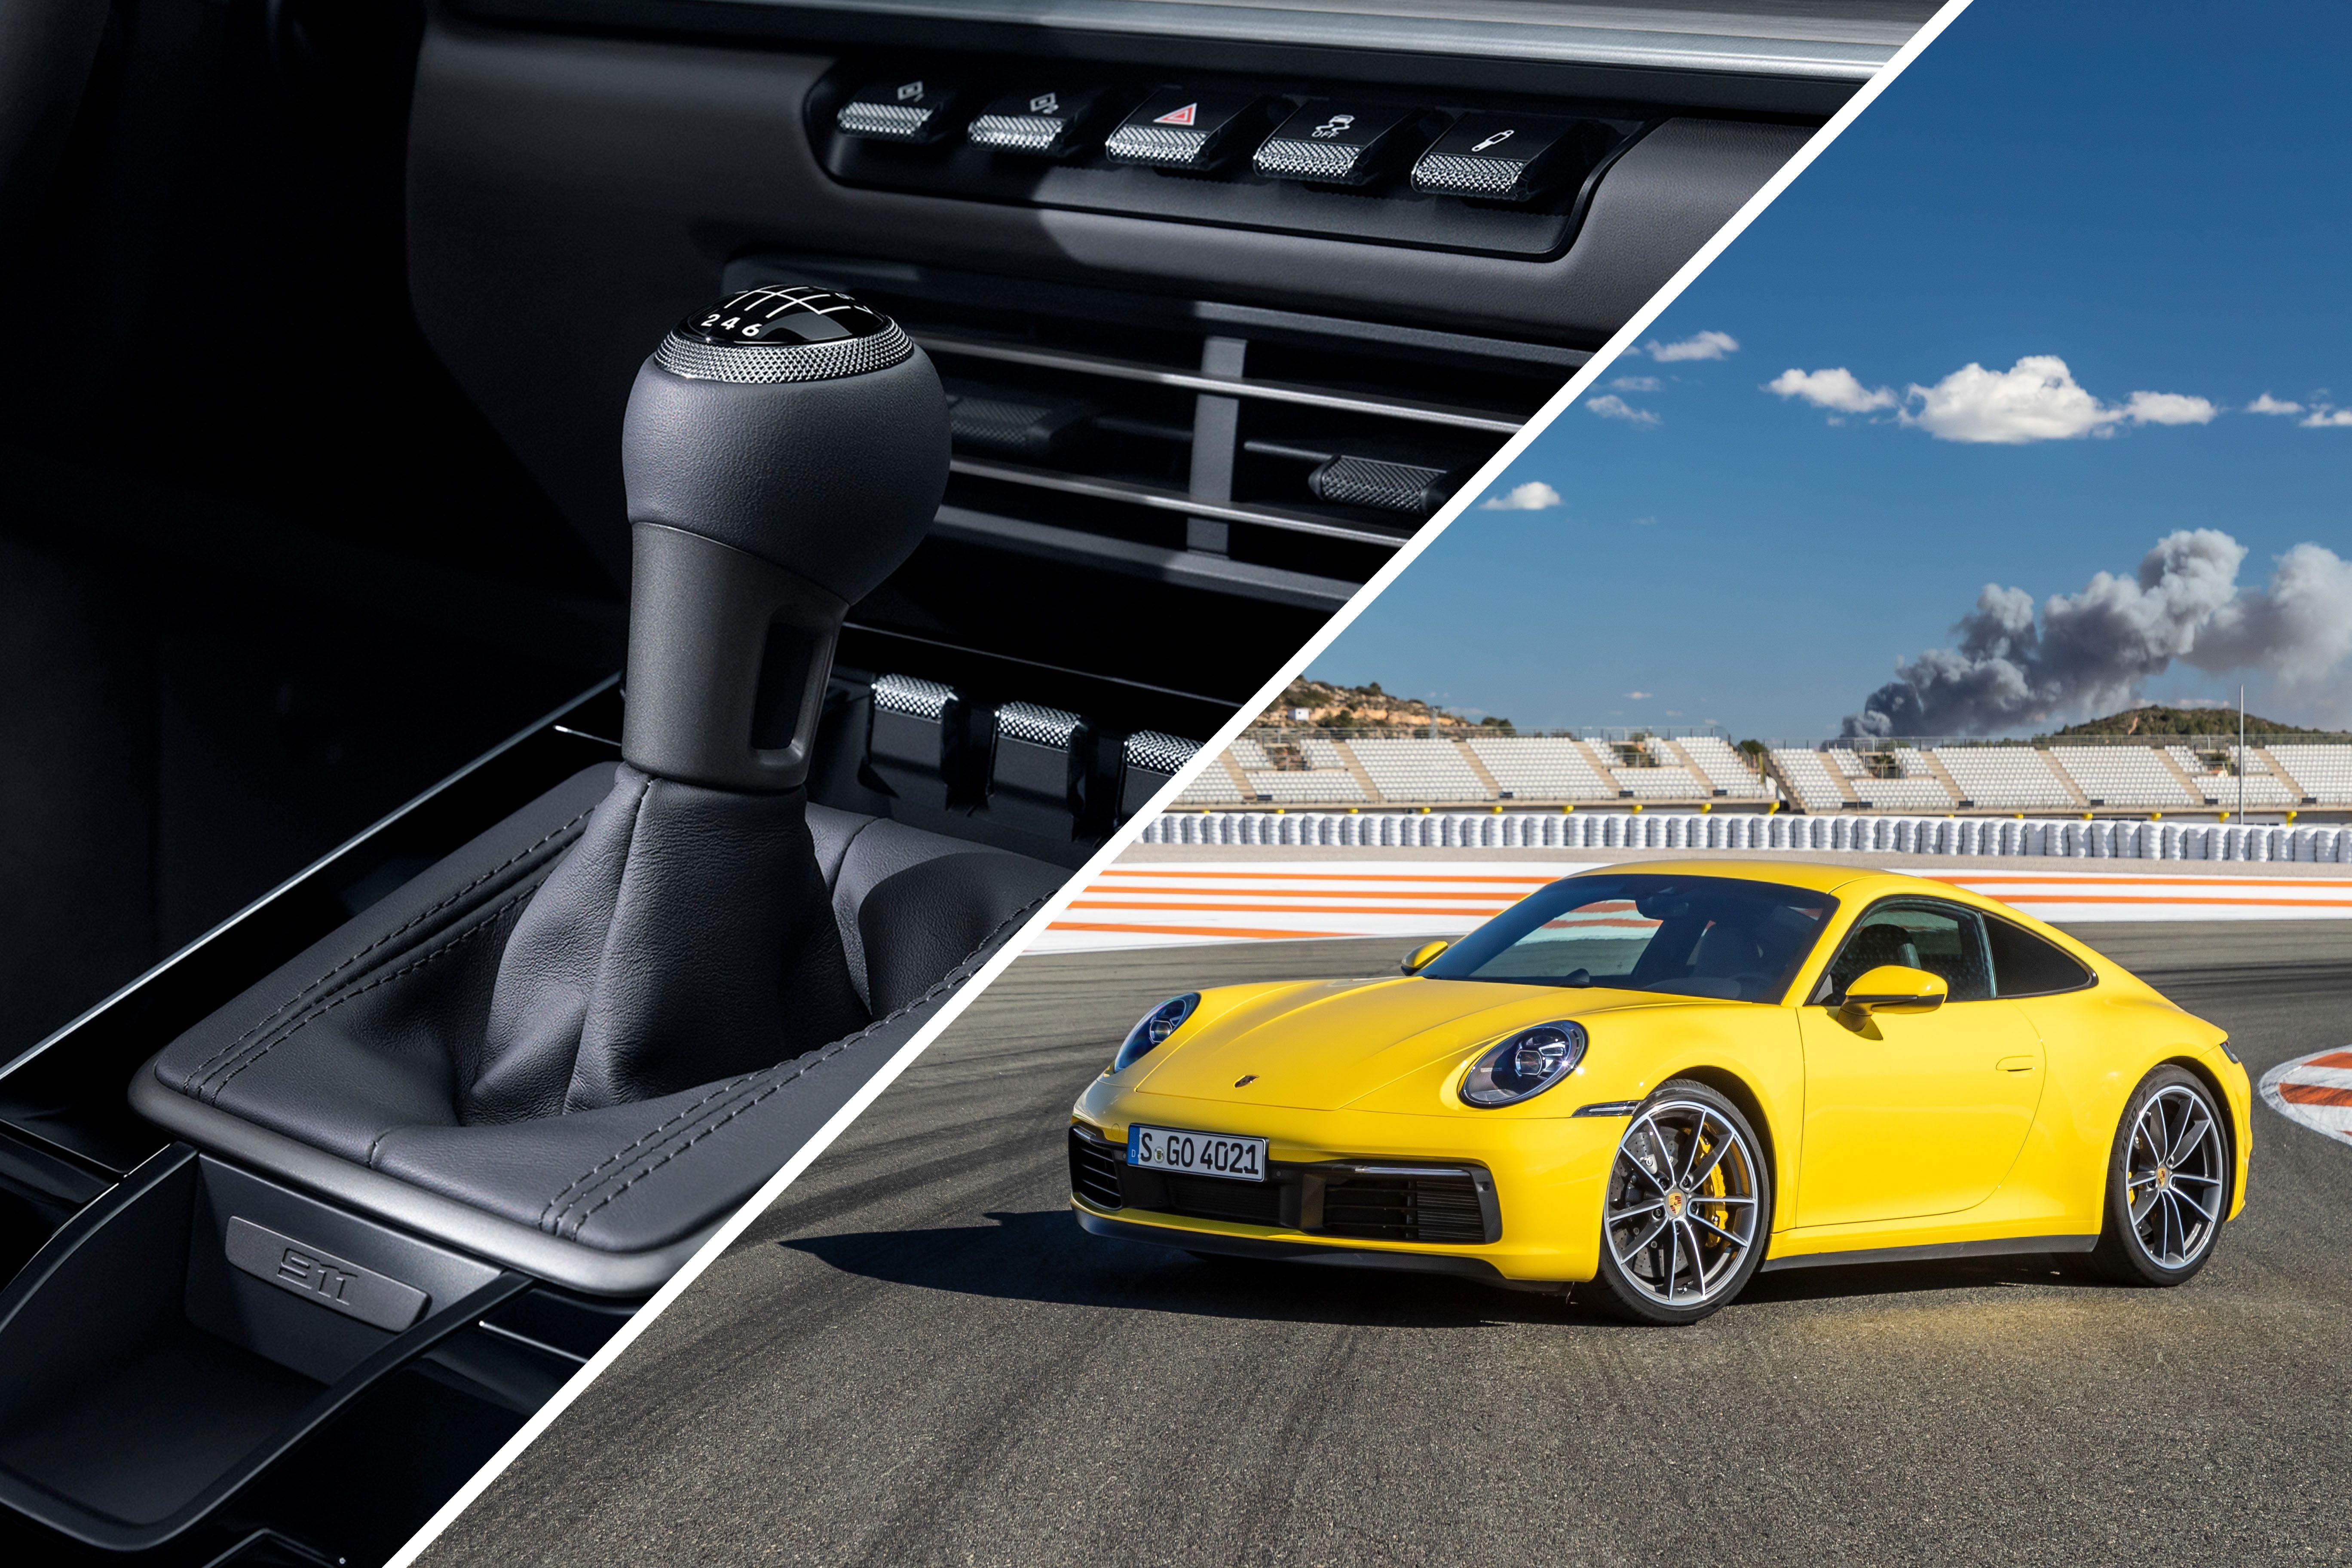 2020 Porsche 911 Carrera S Finally Available With Seven